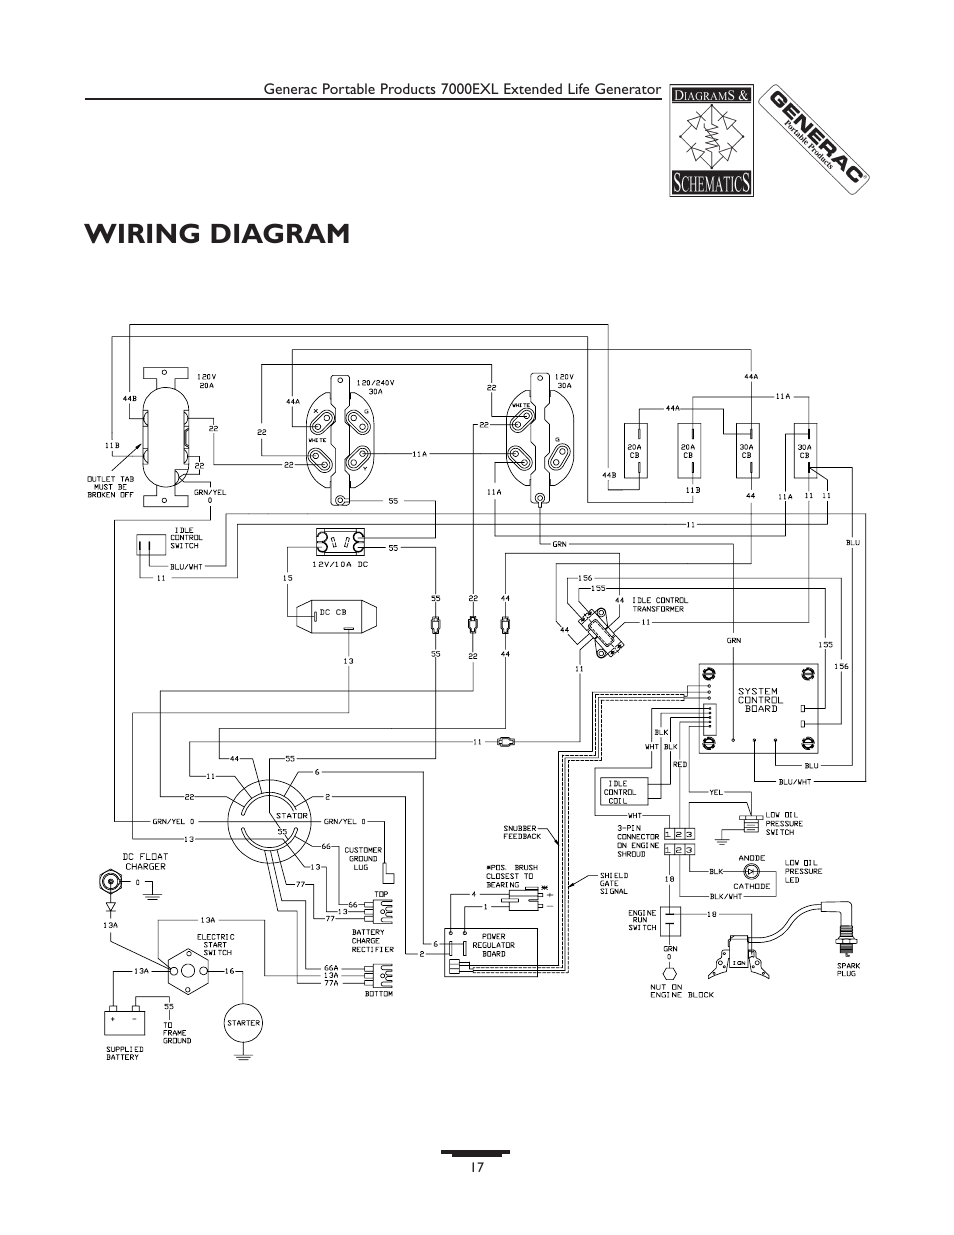 medium resolution of wiring diagram pioneer deh p4000ub uc xs wiring diagram pioneer deh p4000ub uc xs